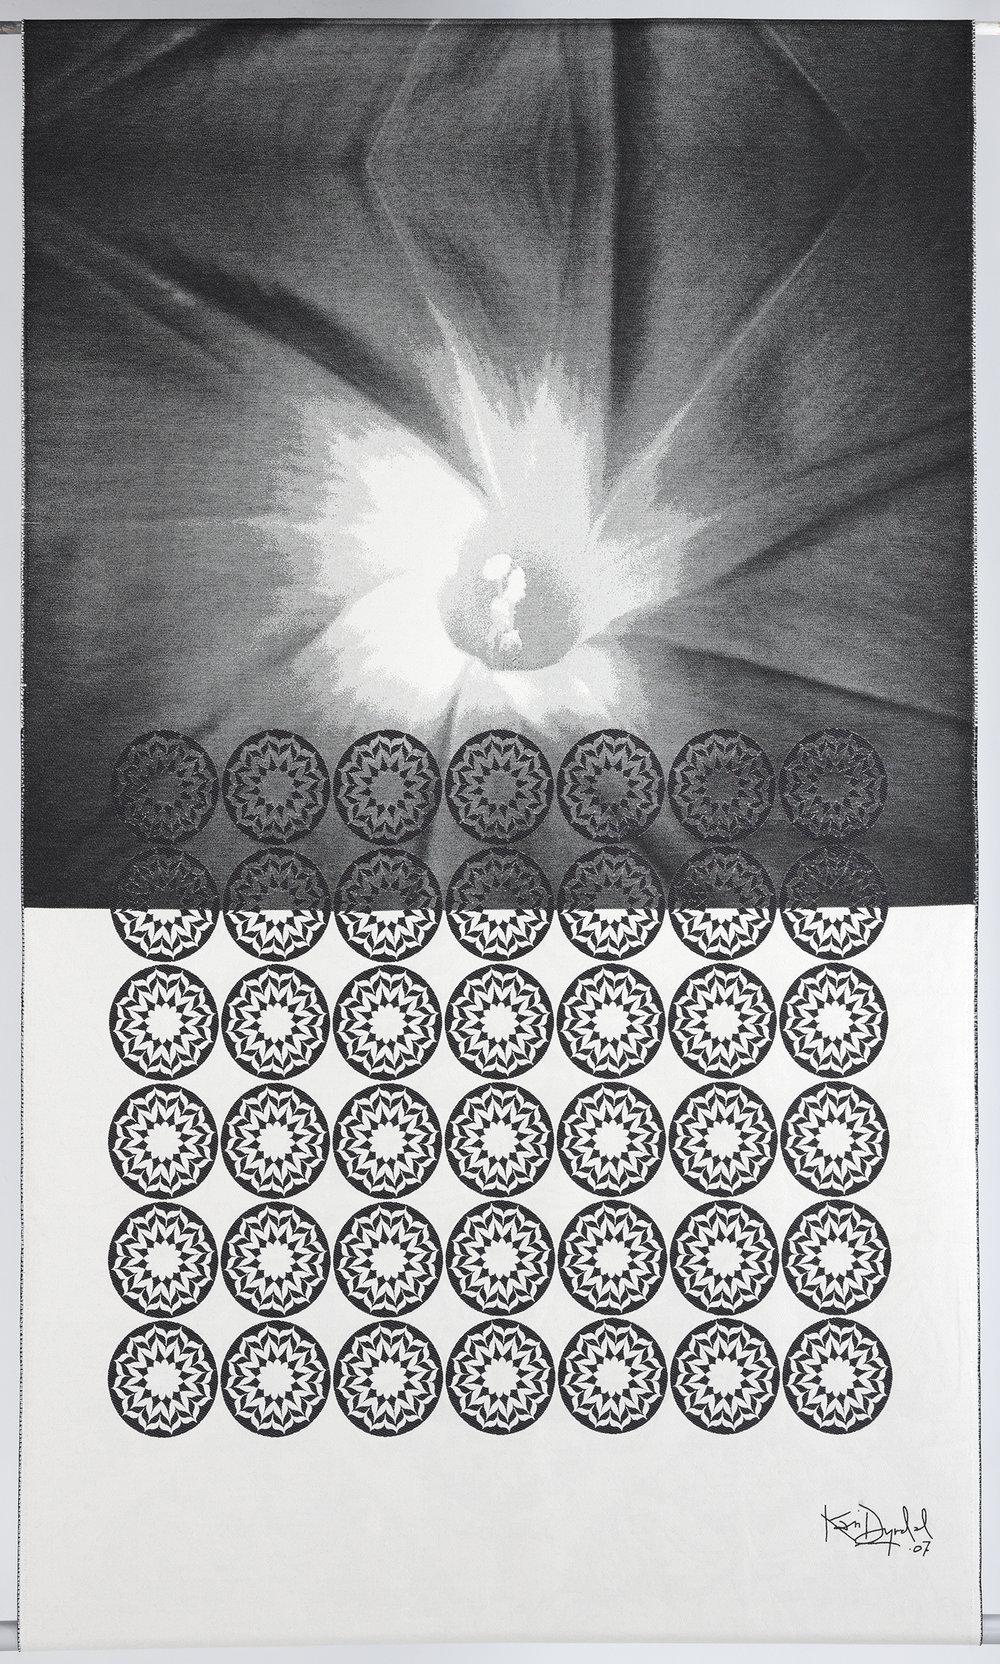 Anemone med sirklerB.jpg